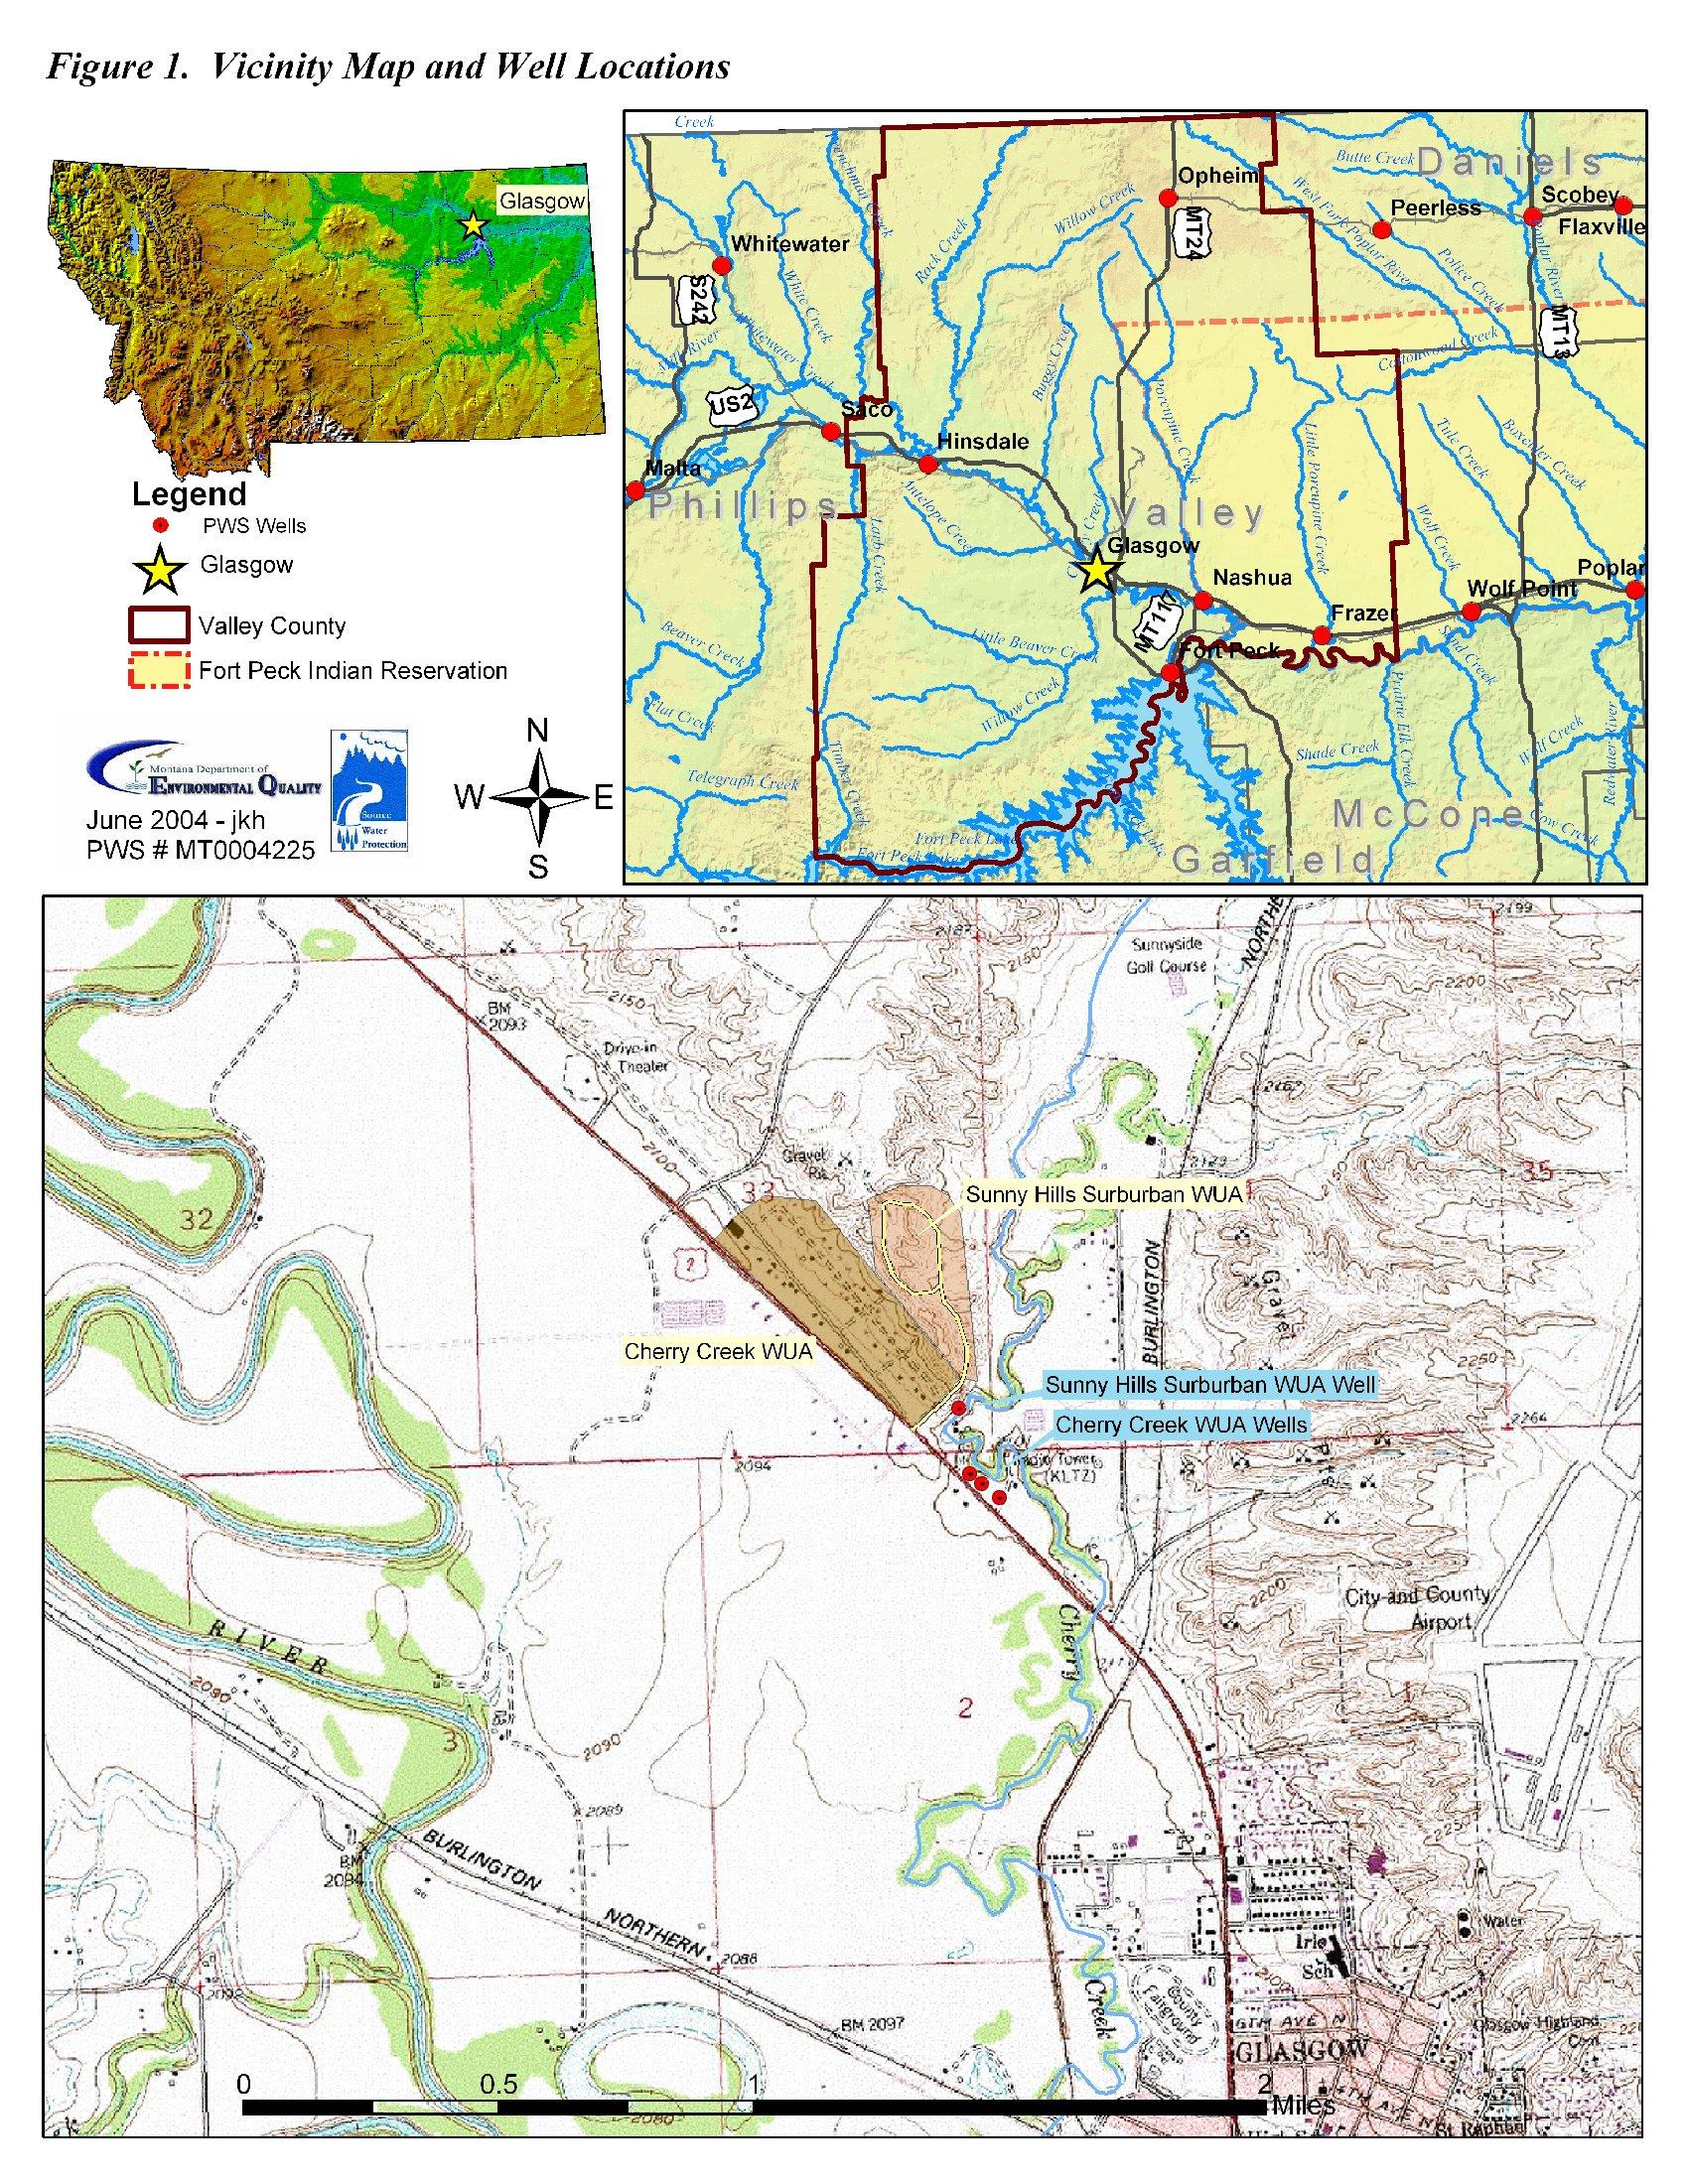 Montana Deq Source Water Assessment Sunny Hills Suburban Wua Sunburst